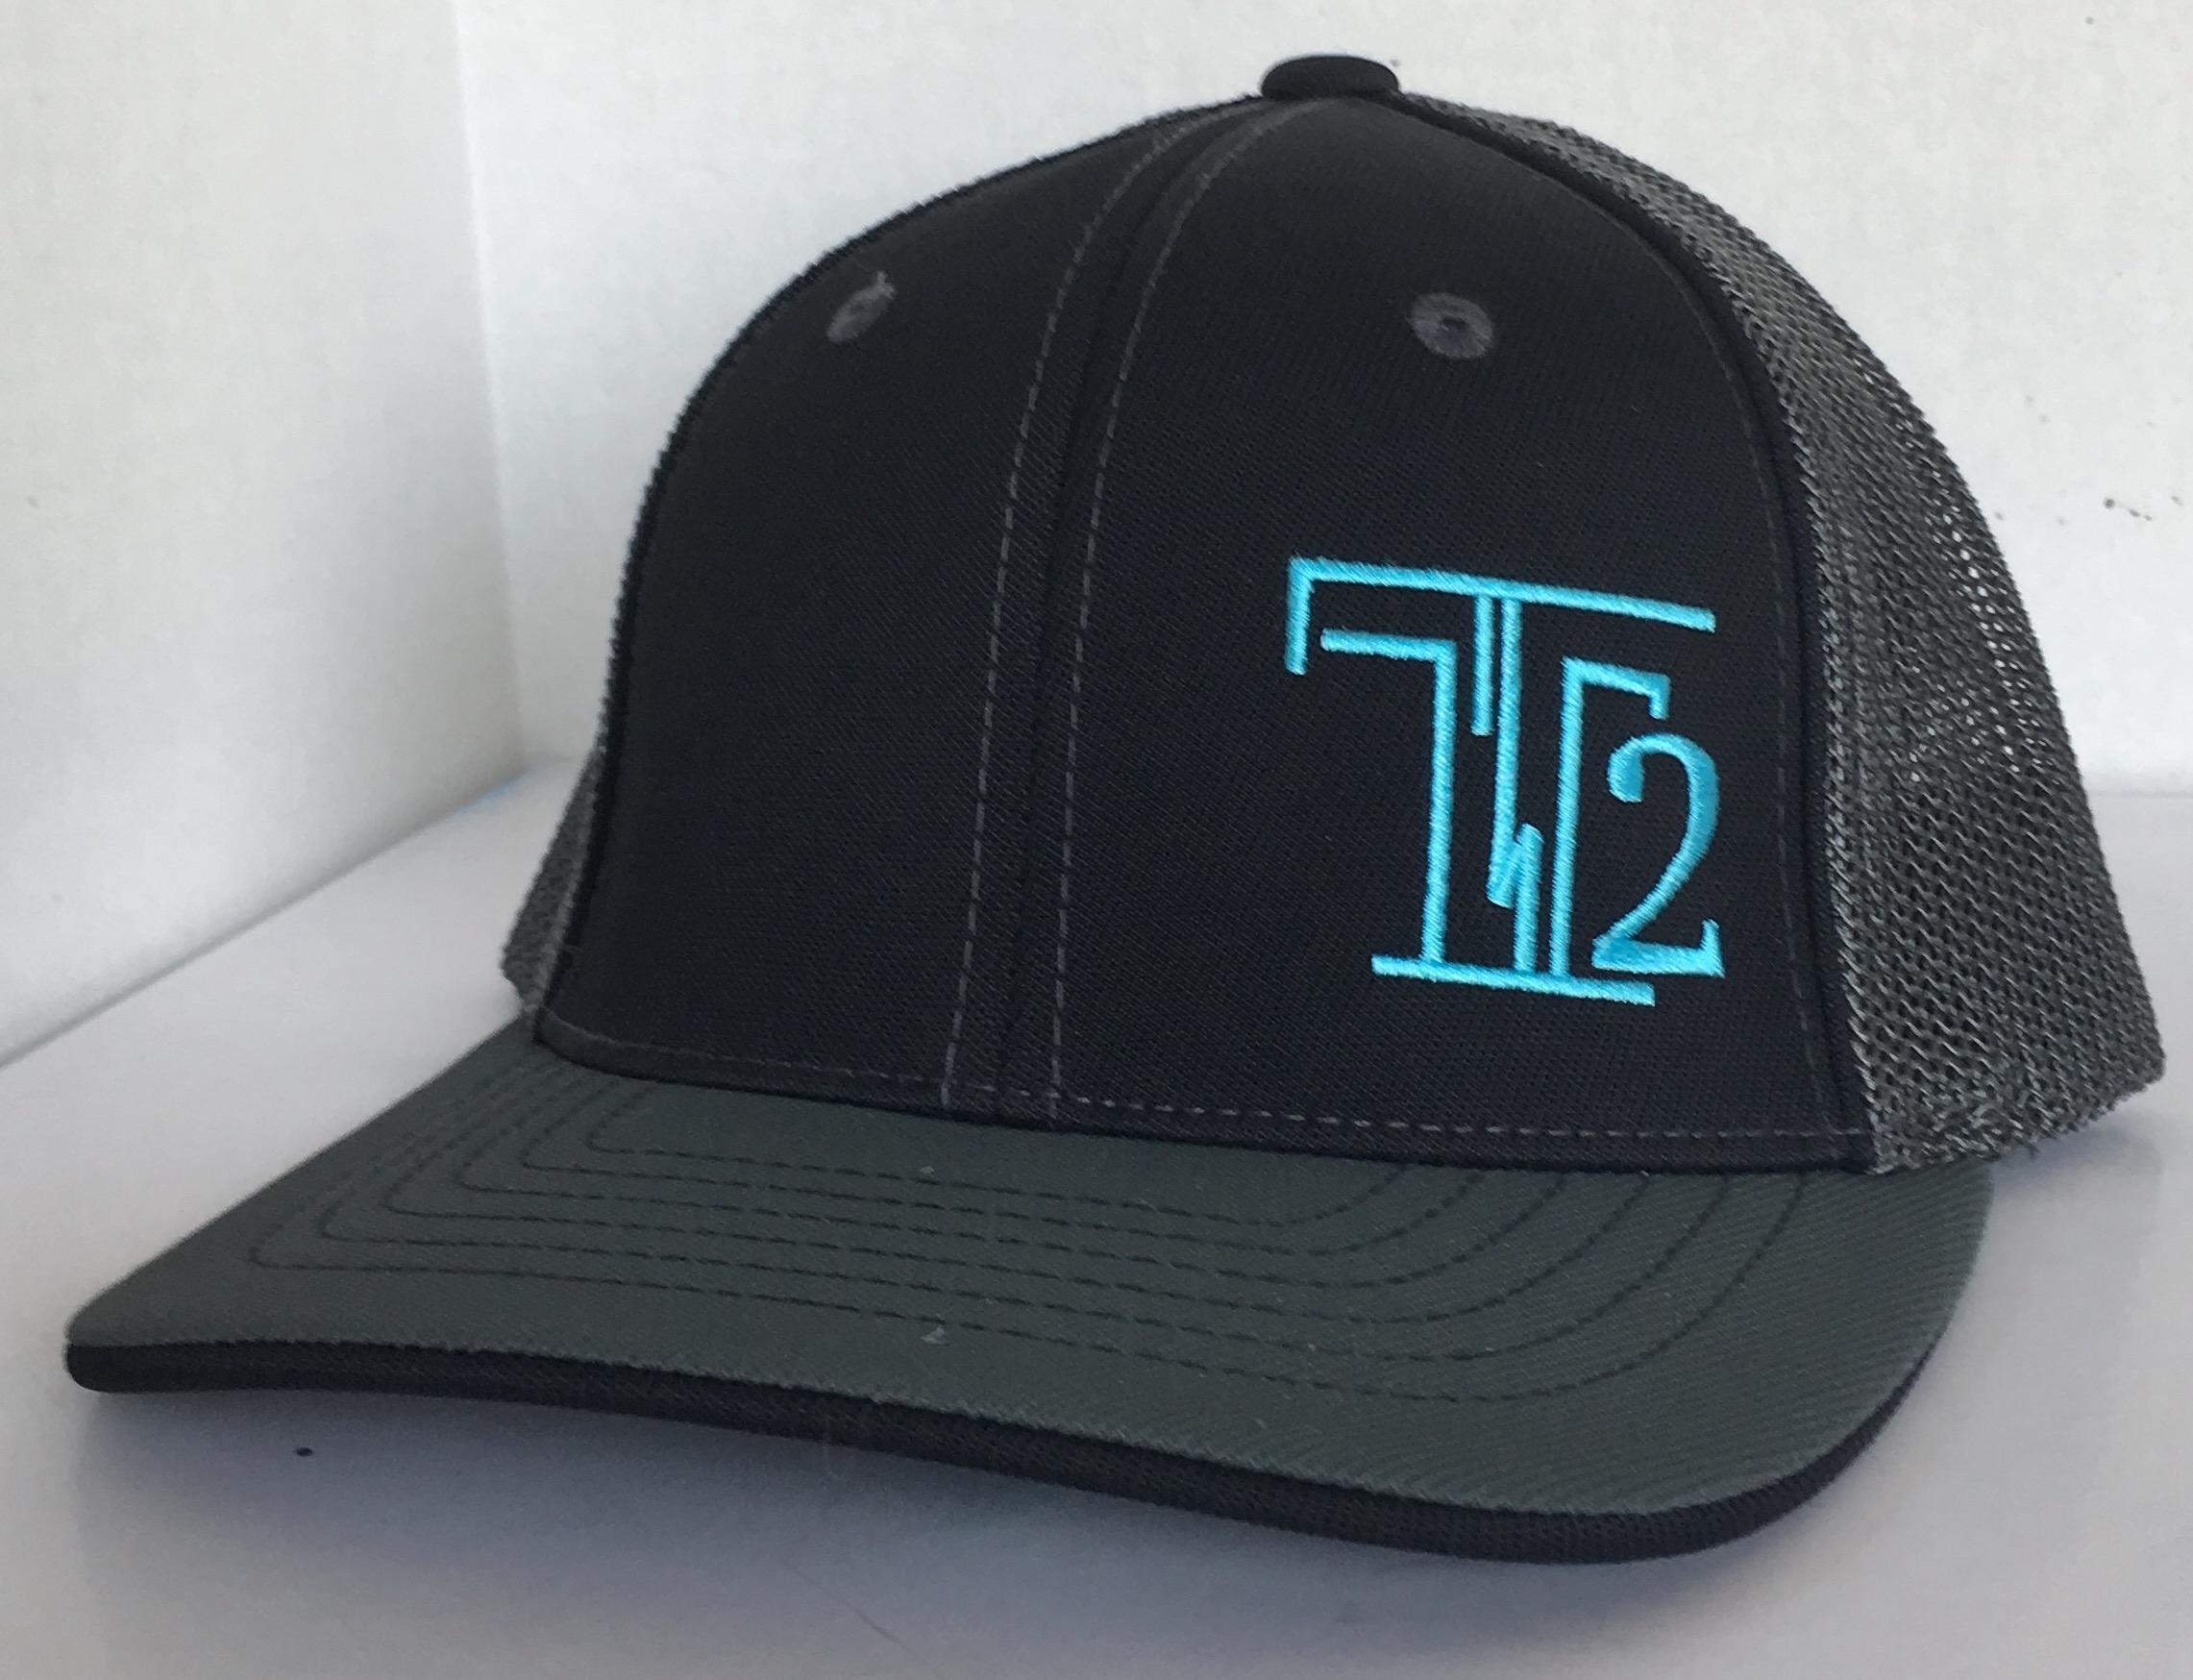 T2 Black-Teal